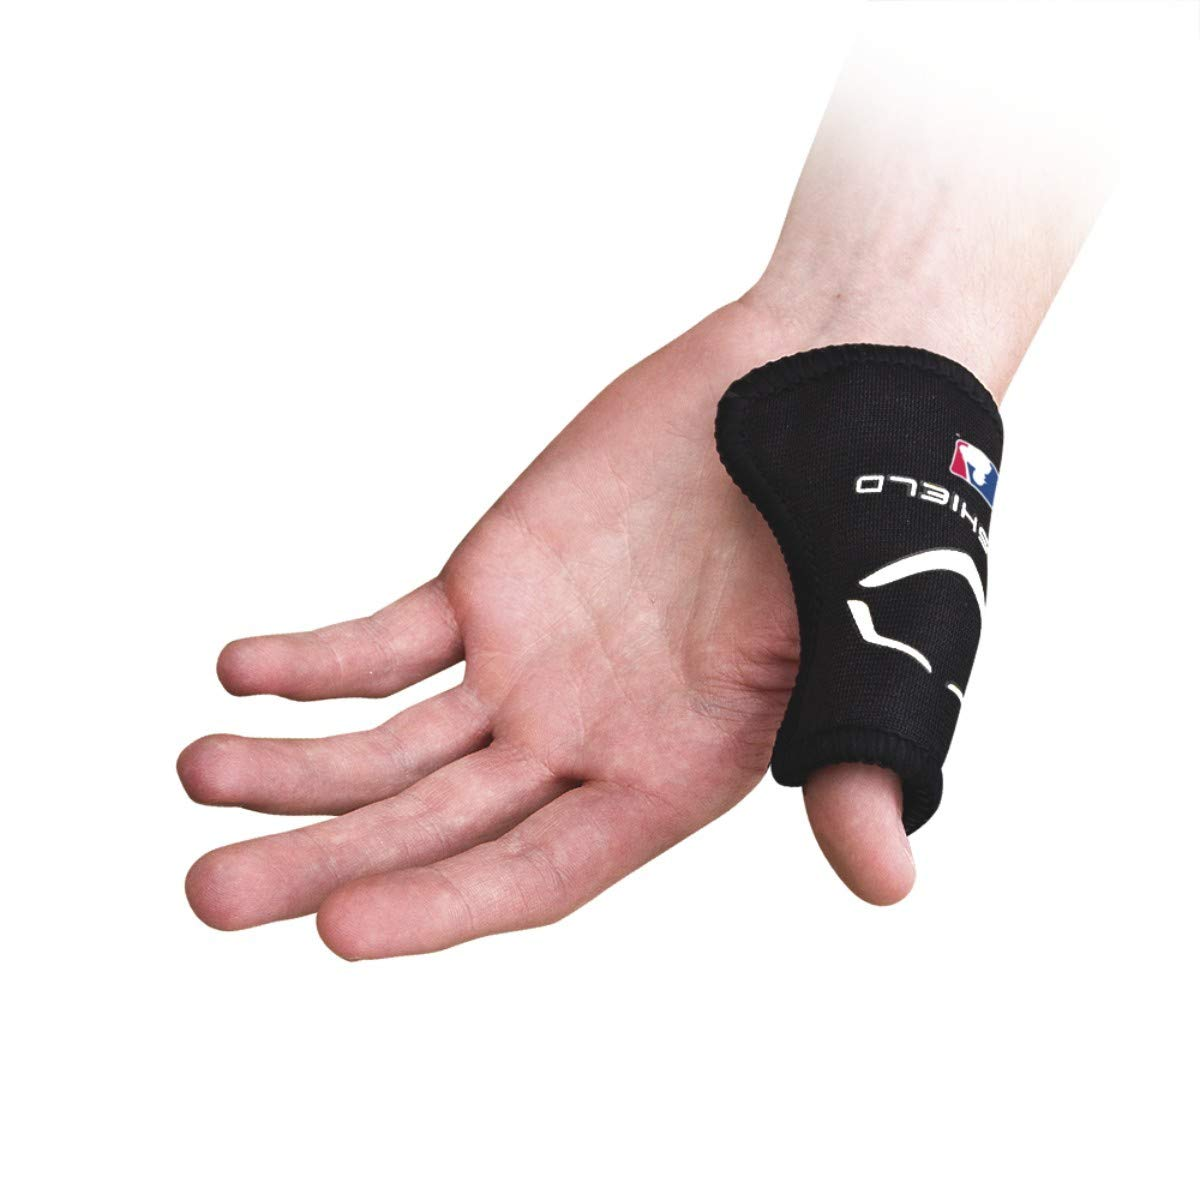 EvoShield Protective Thumb Guard 2021 spring and summer new 5